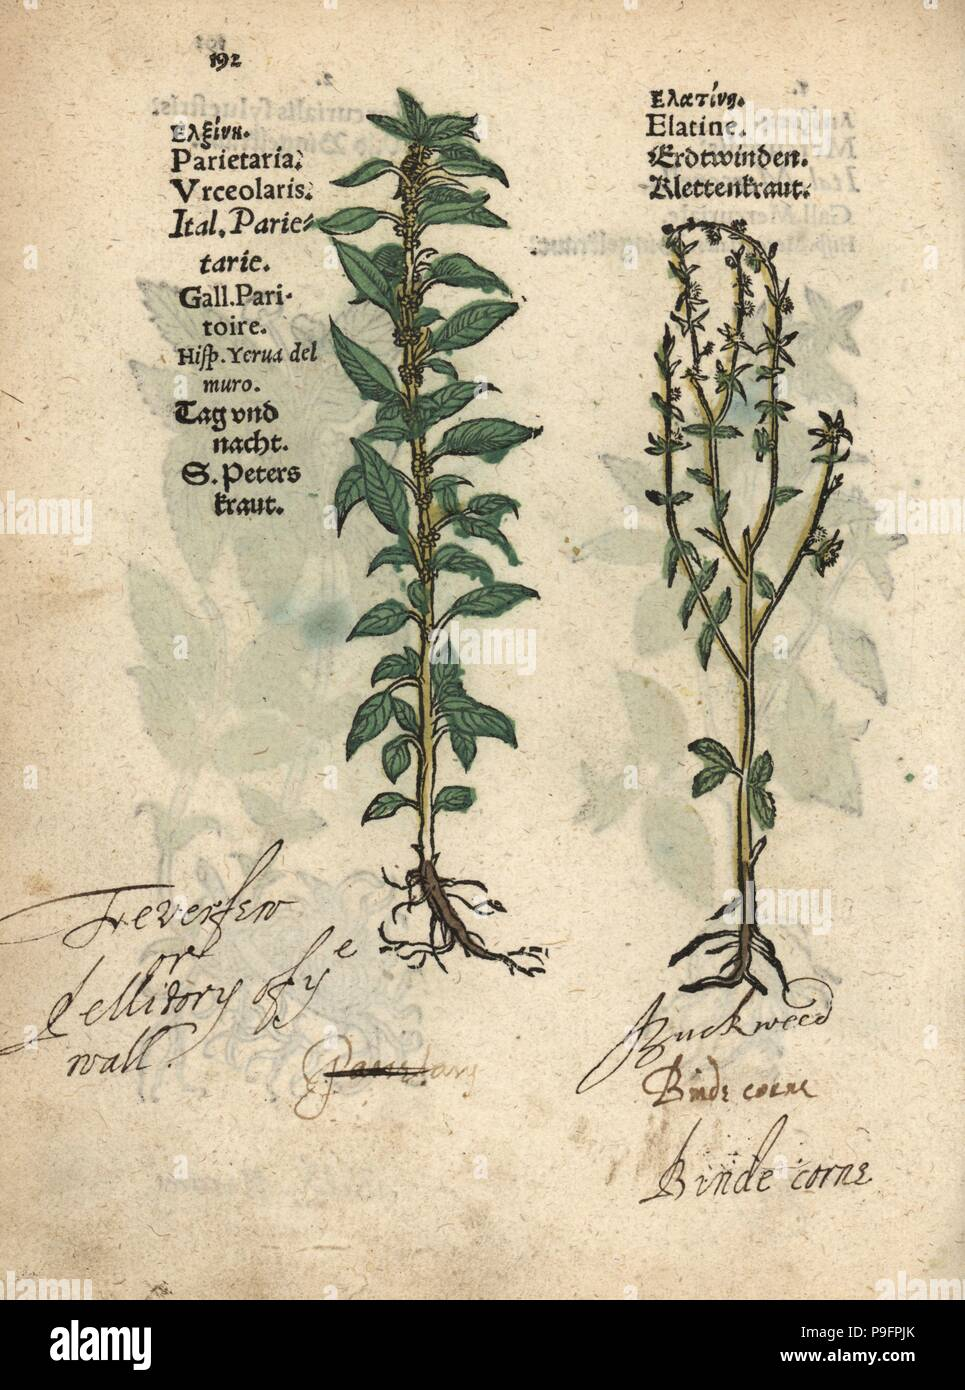 De La Pared Pellitory P Lenes De Parietaria Officinalis Planta